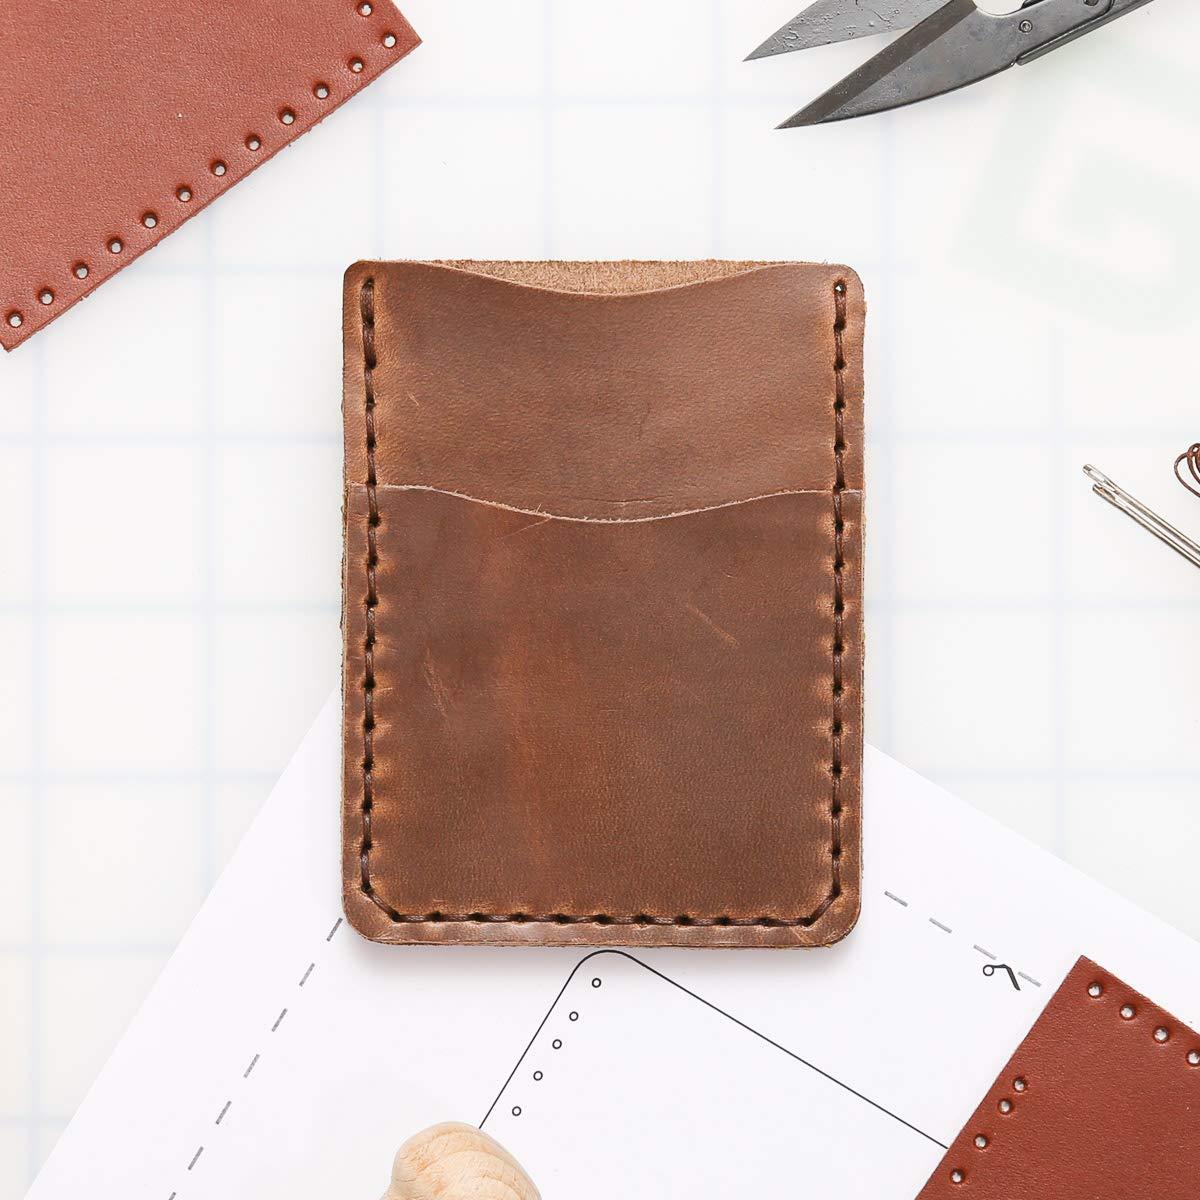 DIY List price Leather Kit - Clip SALENEW very popular Money Wallet